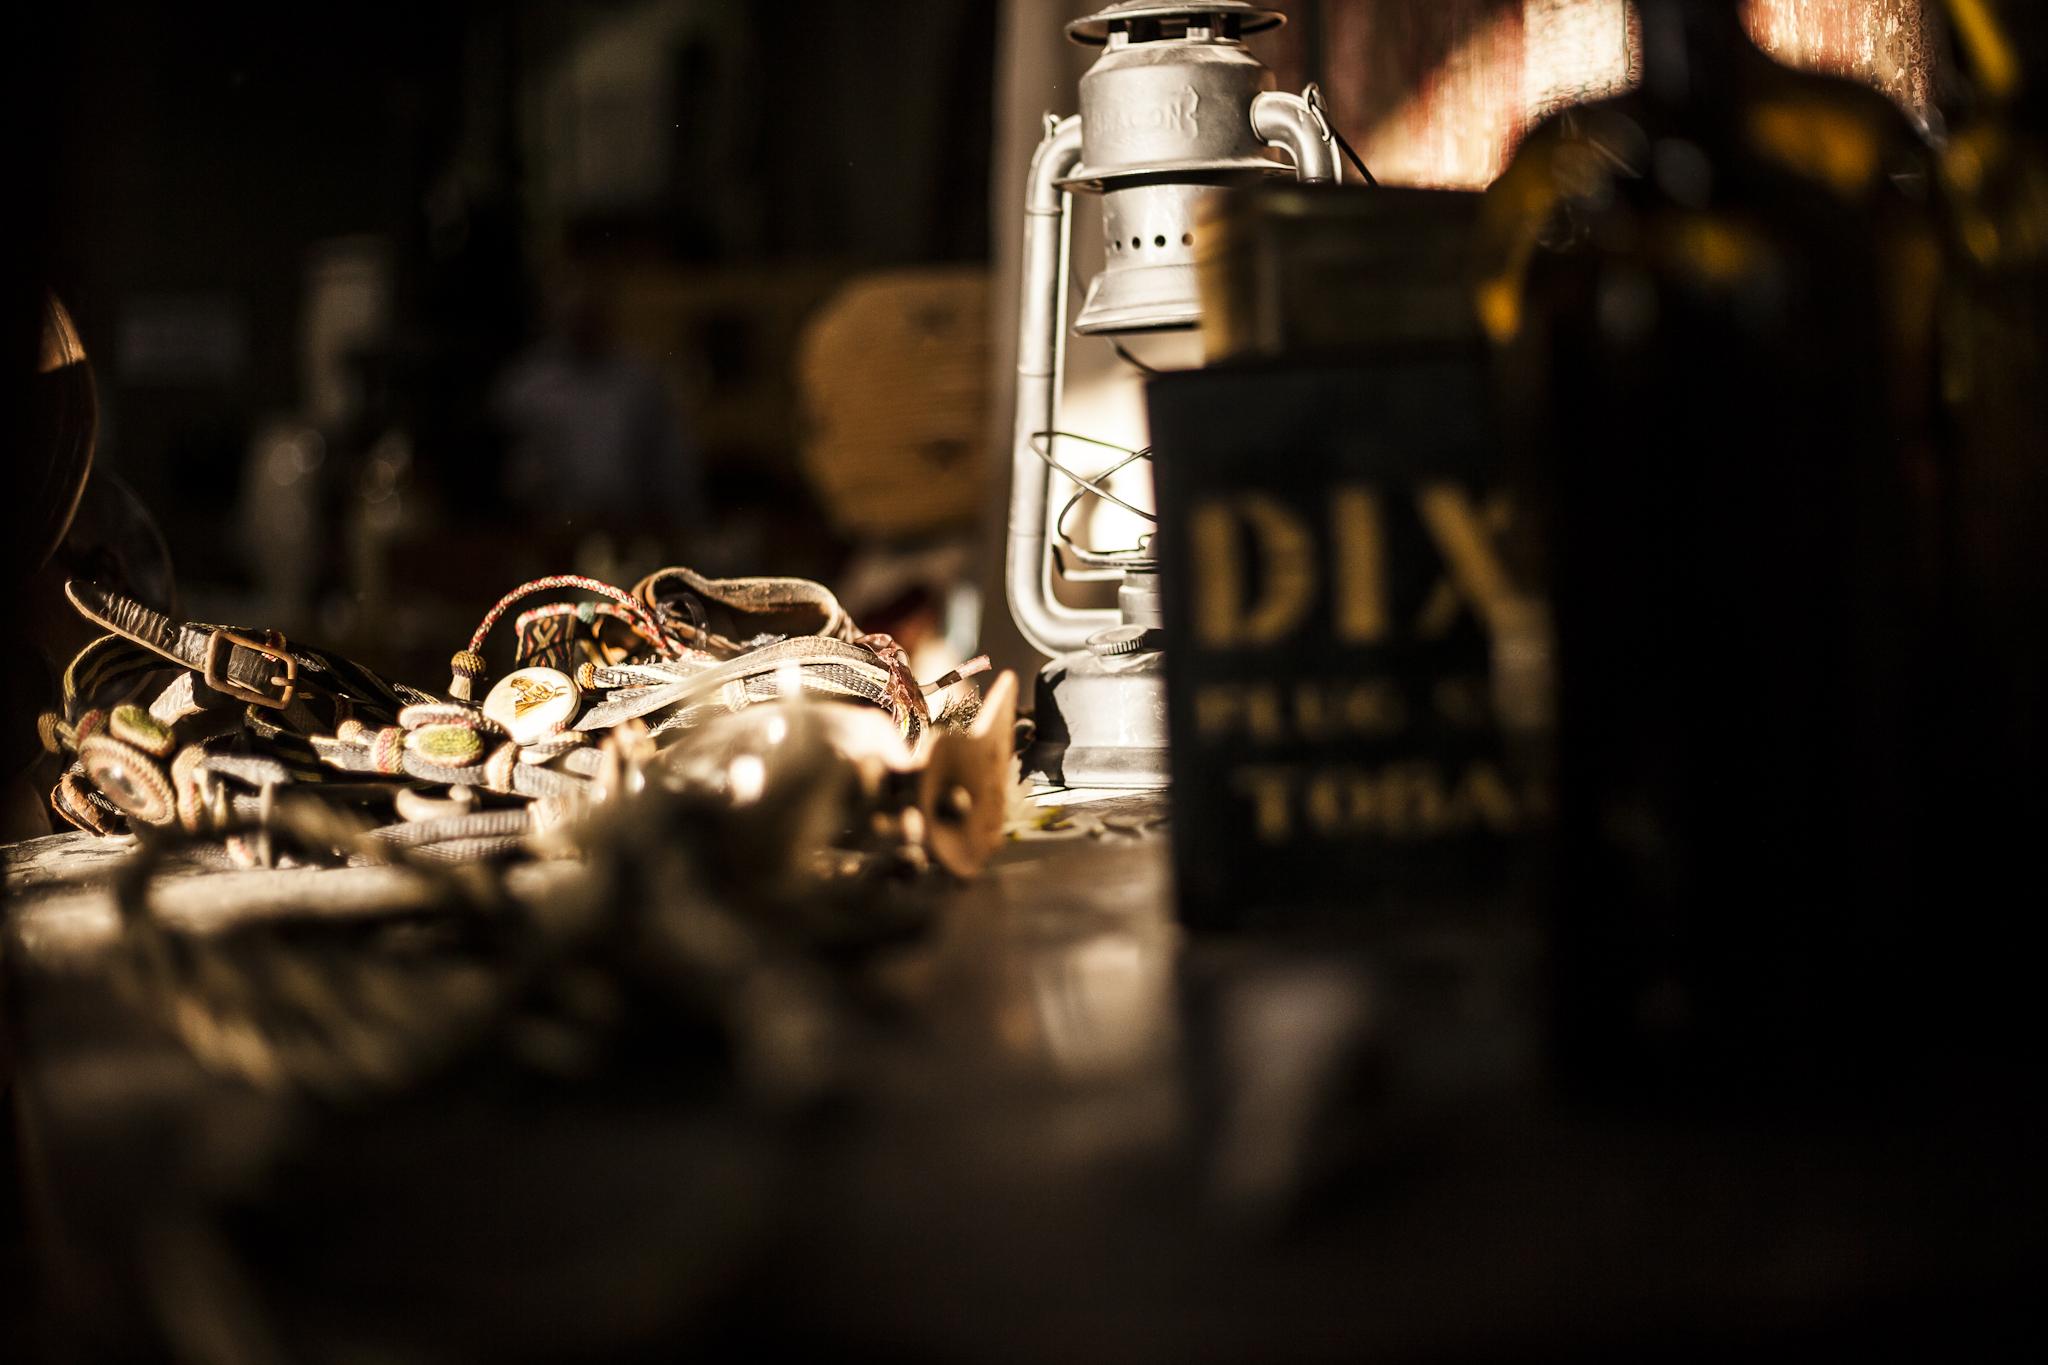 Antique Dixie Oil, Primitive Spurs and an Old Coal Oil Lamp